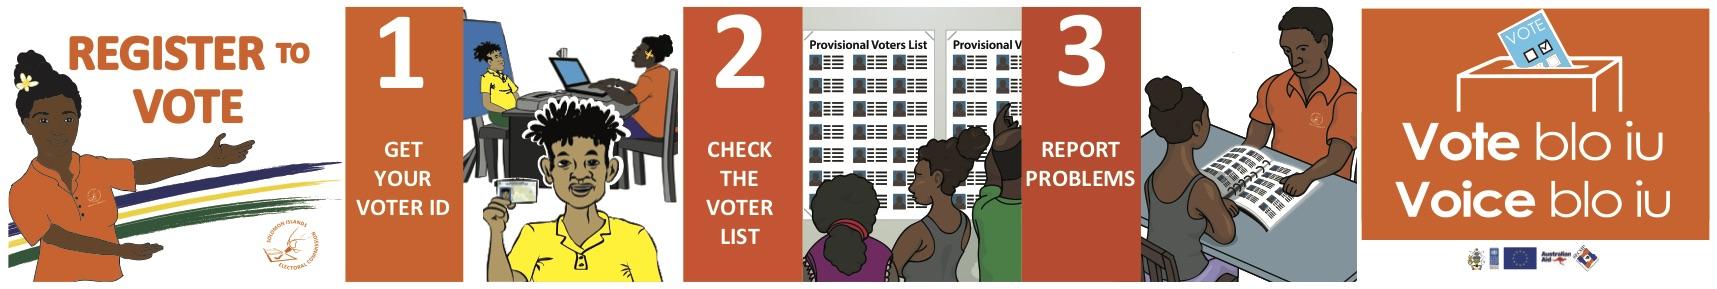 ec-undp-jtf-solomon-islands-voter-education-voter-registration-sticker